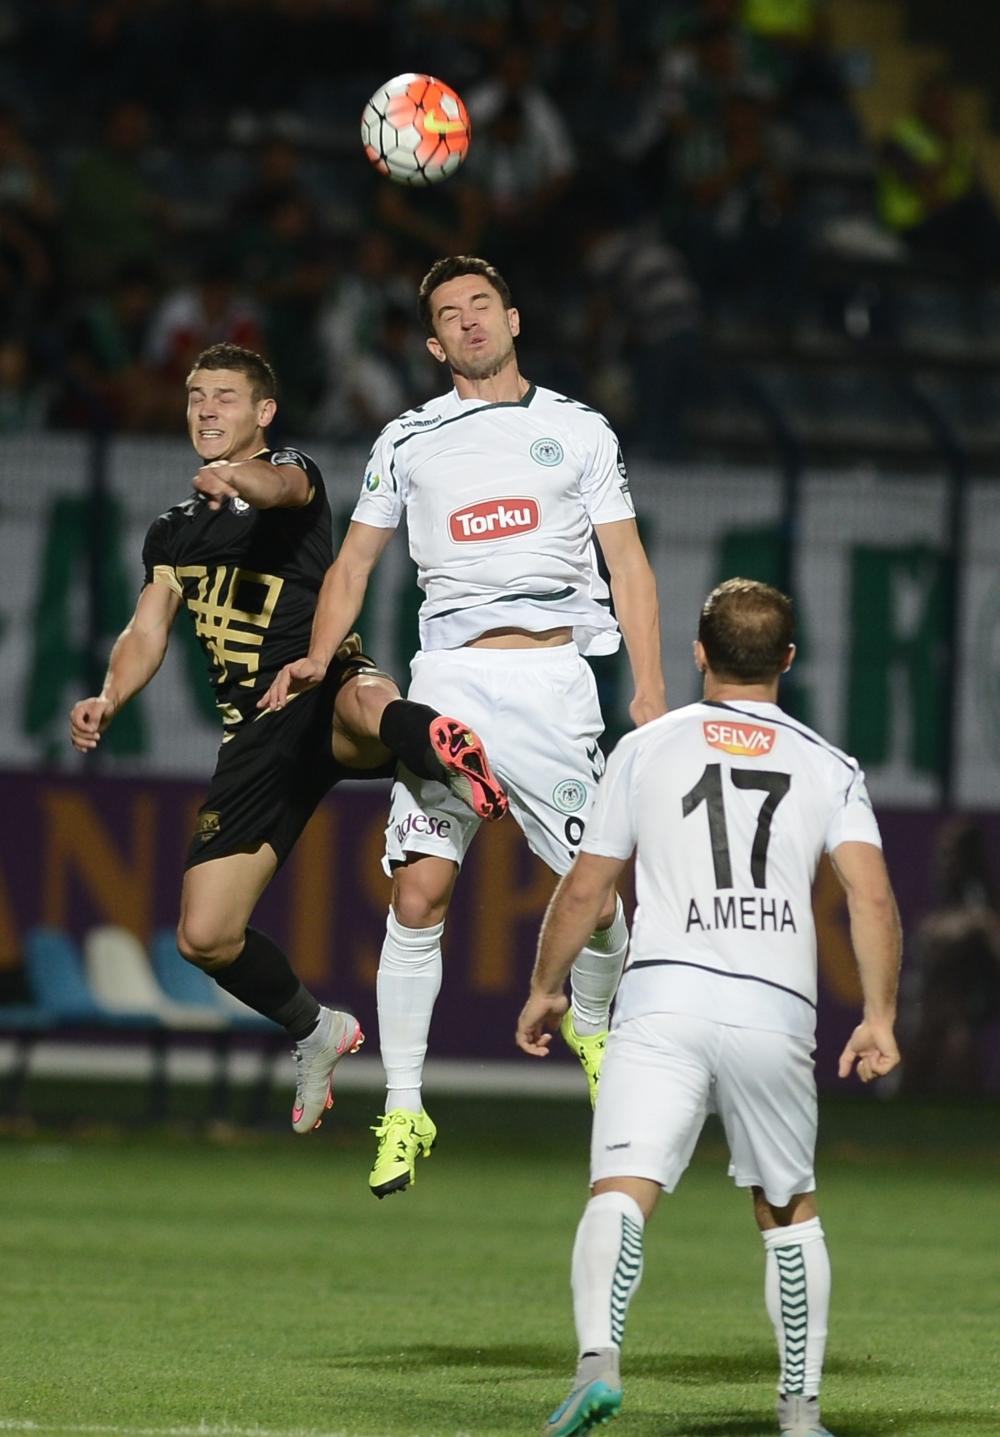 Osmanlıspor-Torku Konyaspor: 1-2 9